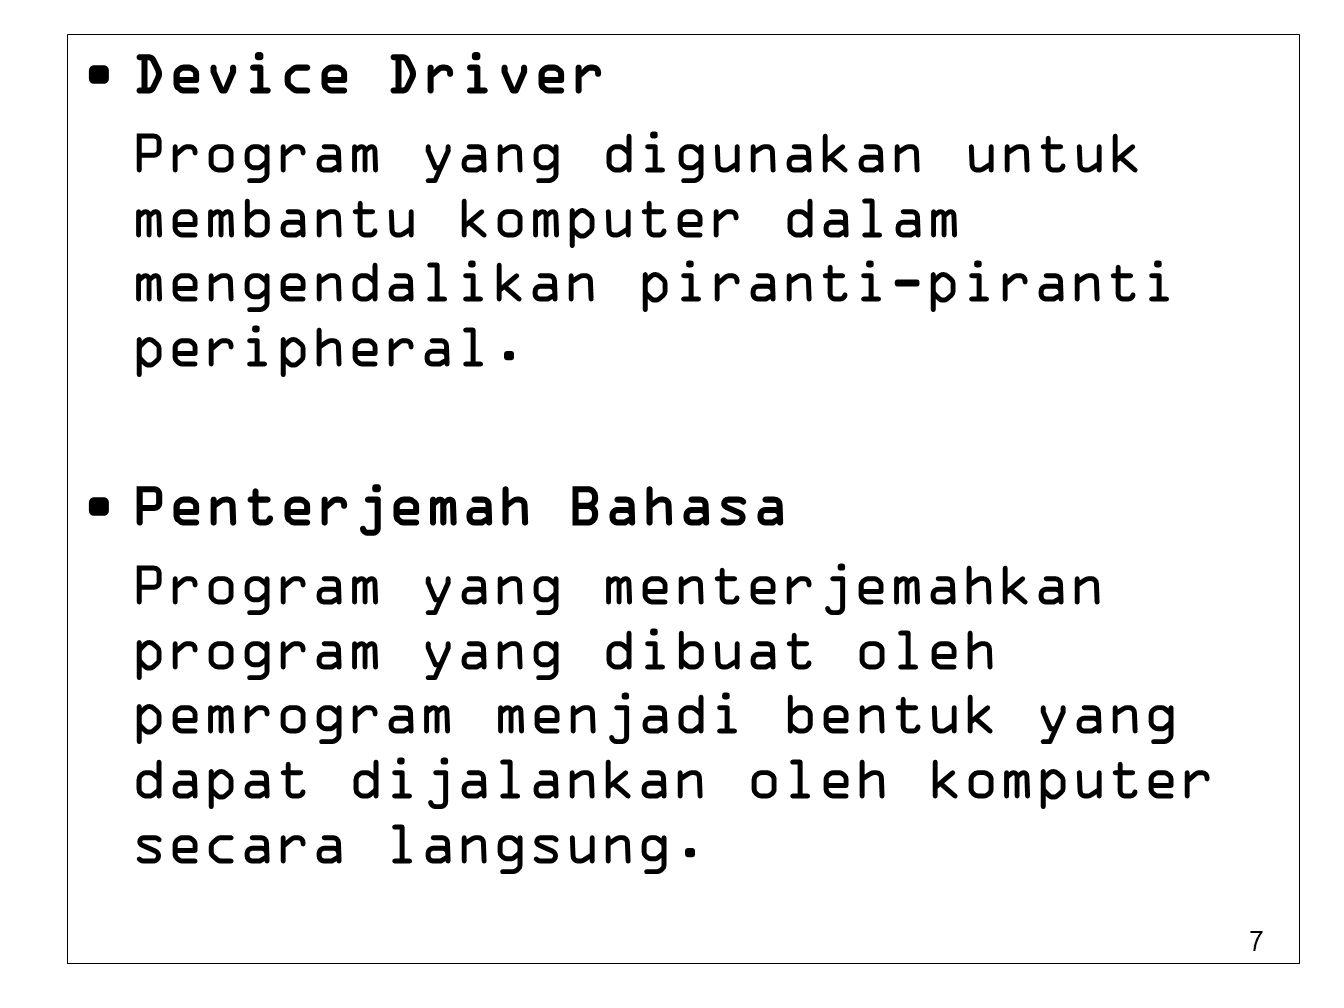 7 Device Driver Program yang digunakan untuk membantu komputer dalam mengendalikan piranti-piranti peripheral. Penterjemah Bahasa Program yang menterj